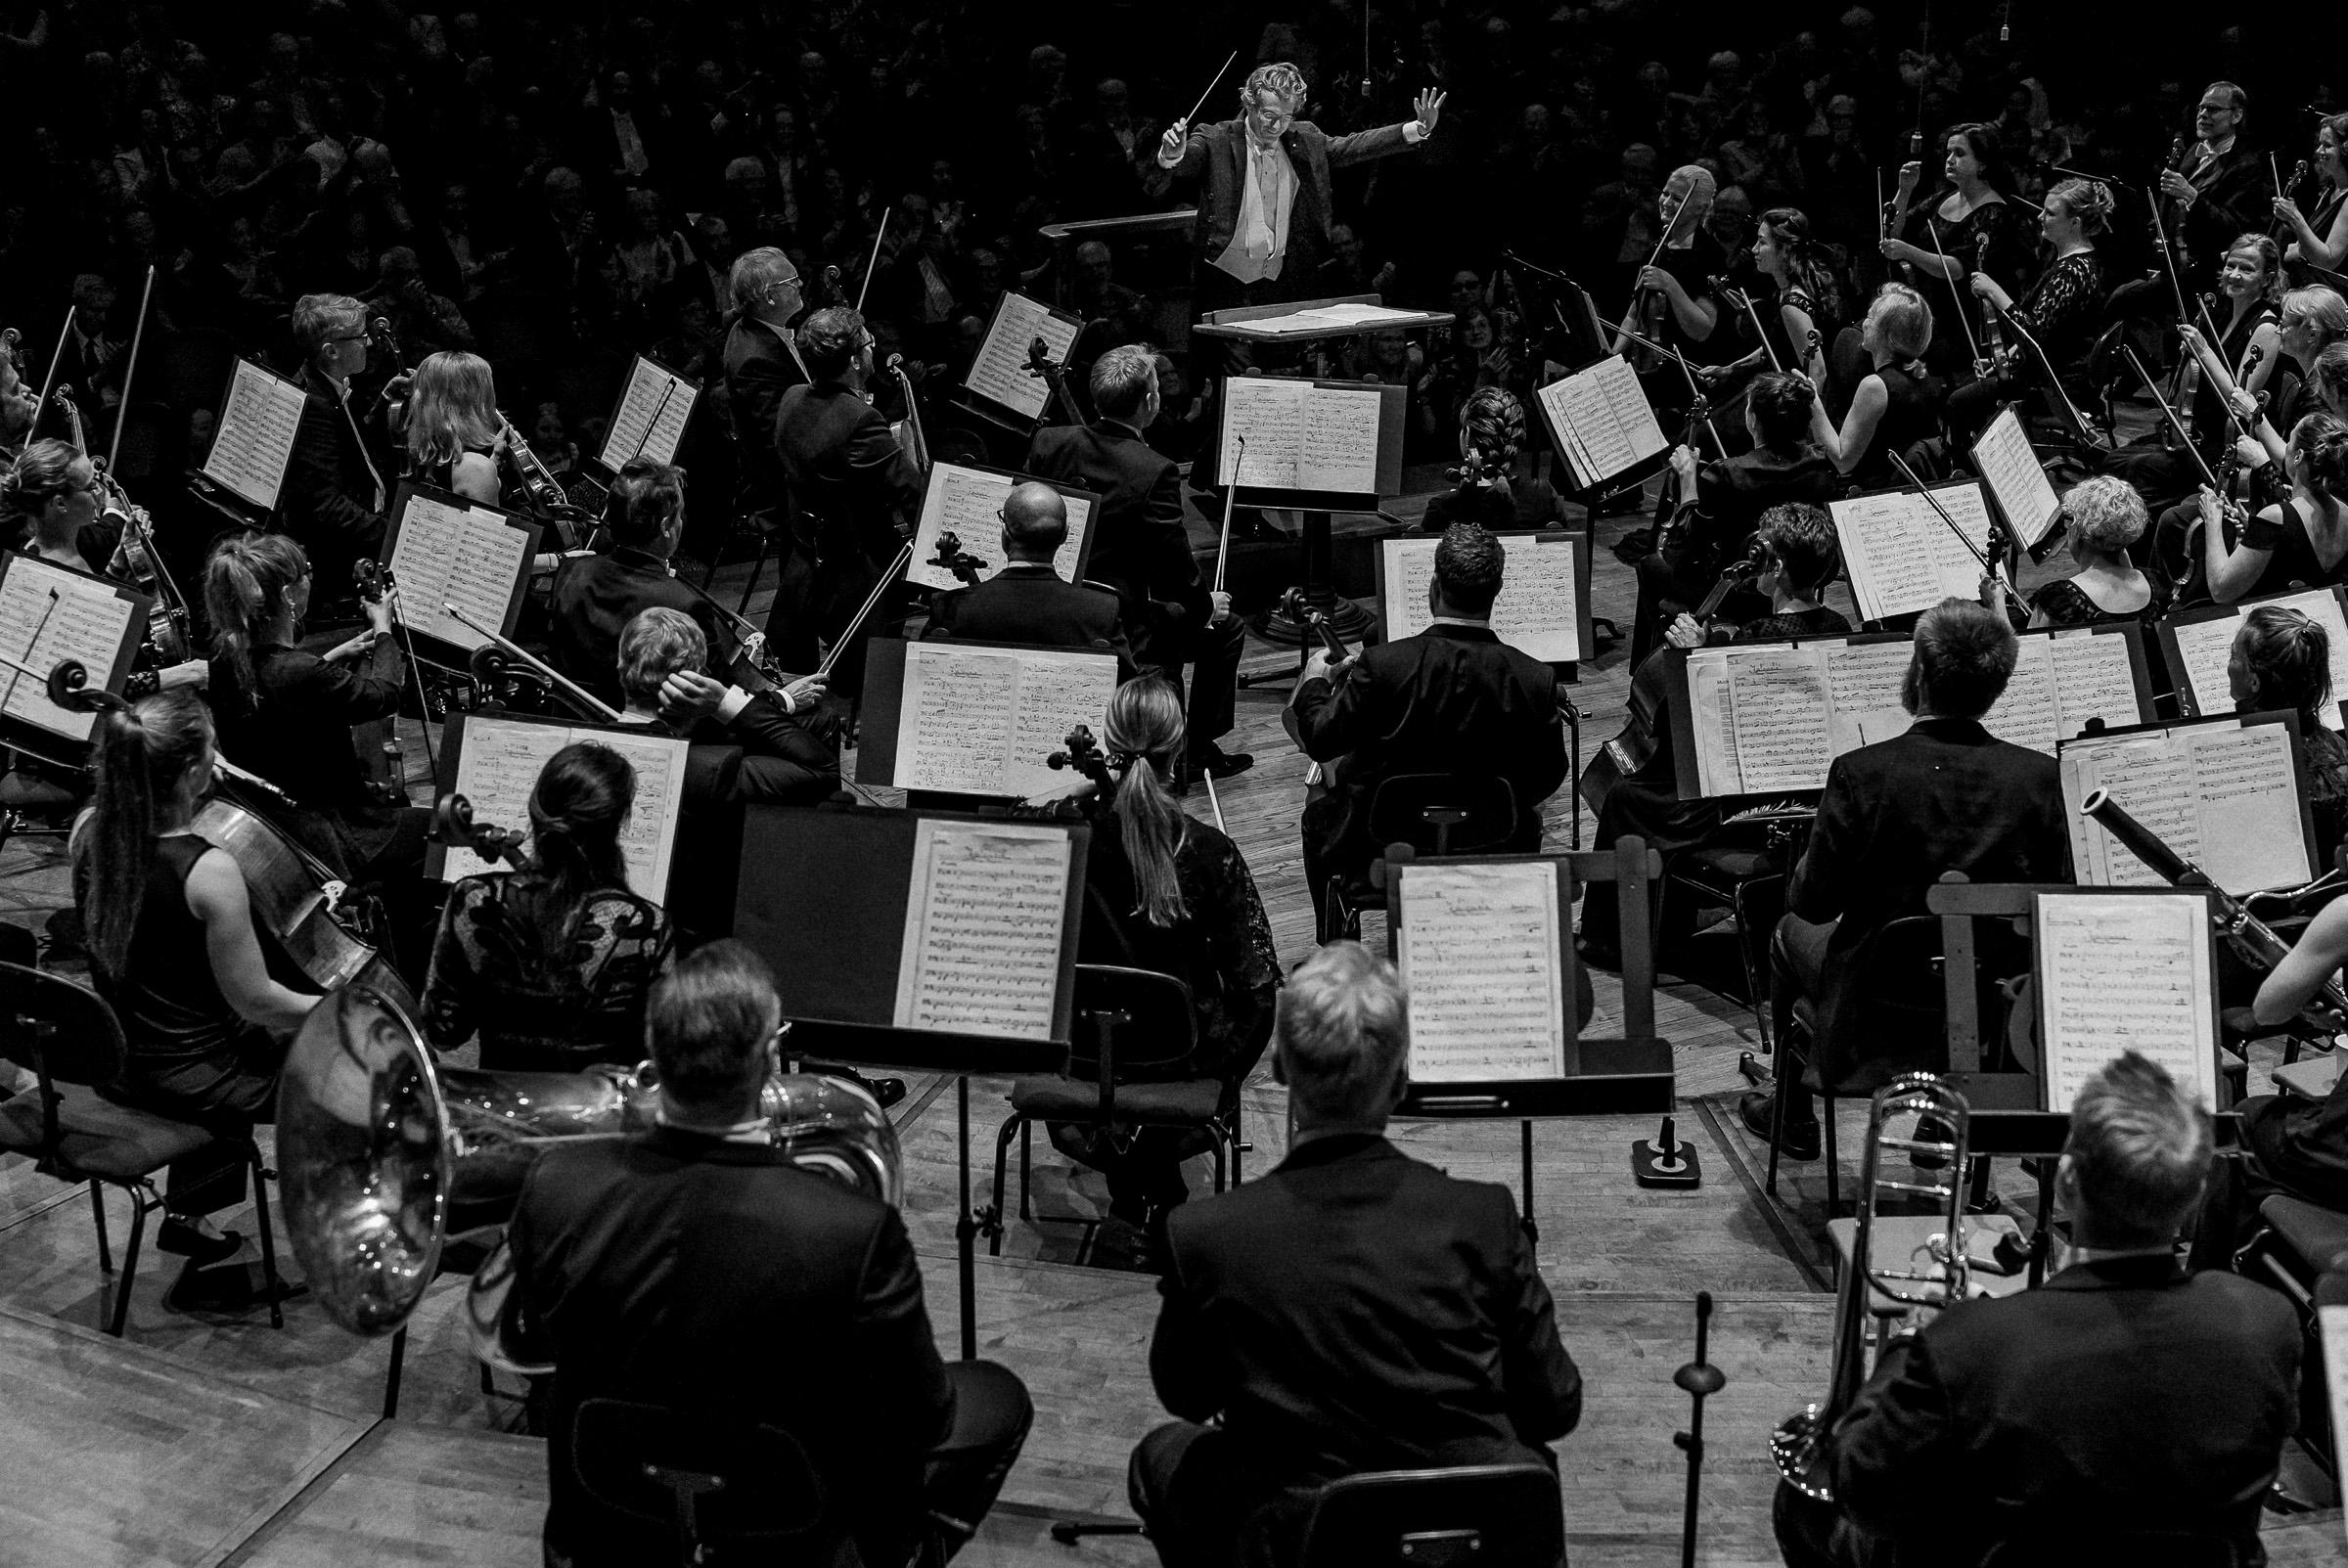 danish_national_symphony_orchestra_davies_hall_brandon_patoc_luisi_0017.jpg